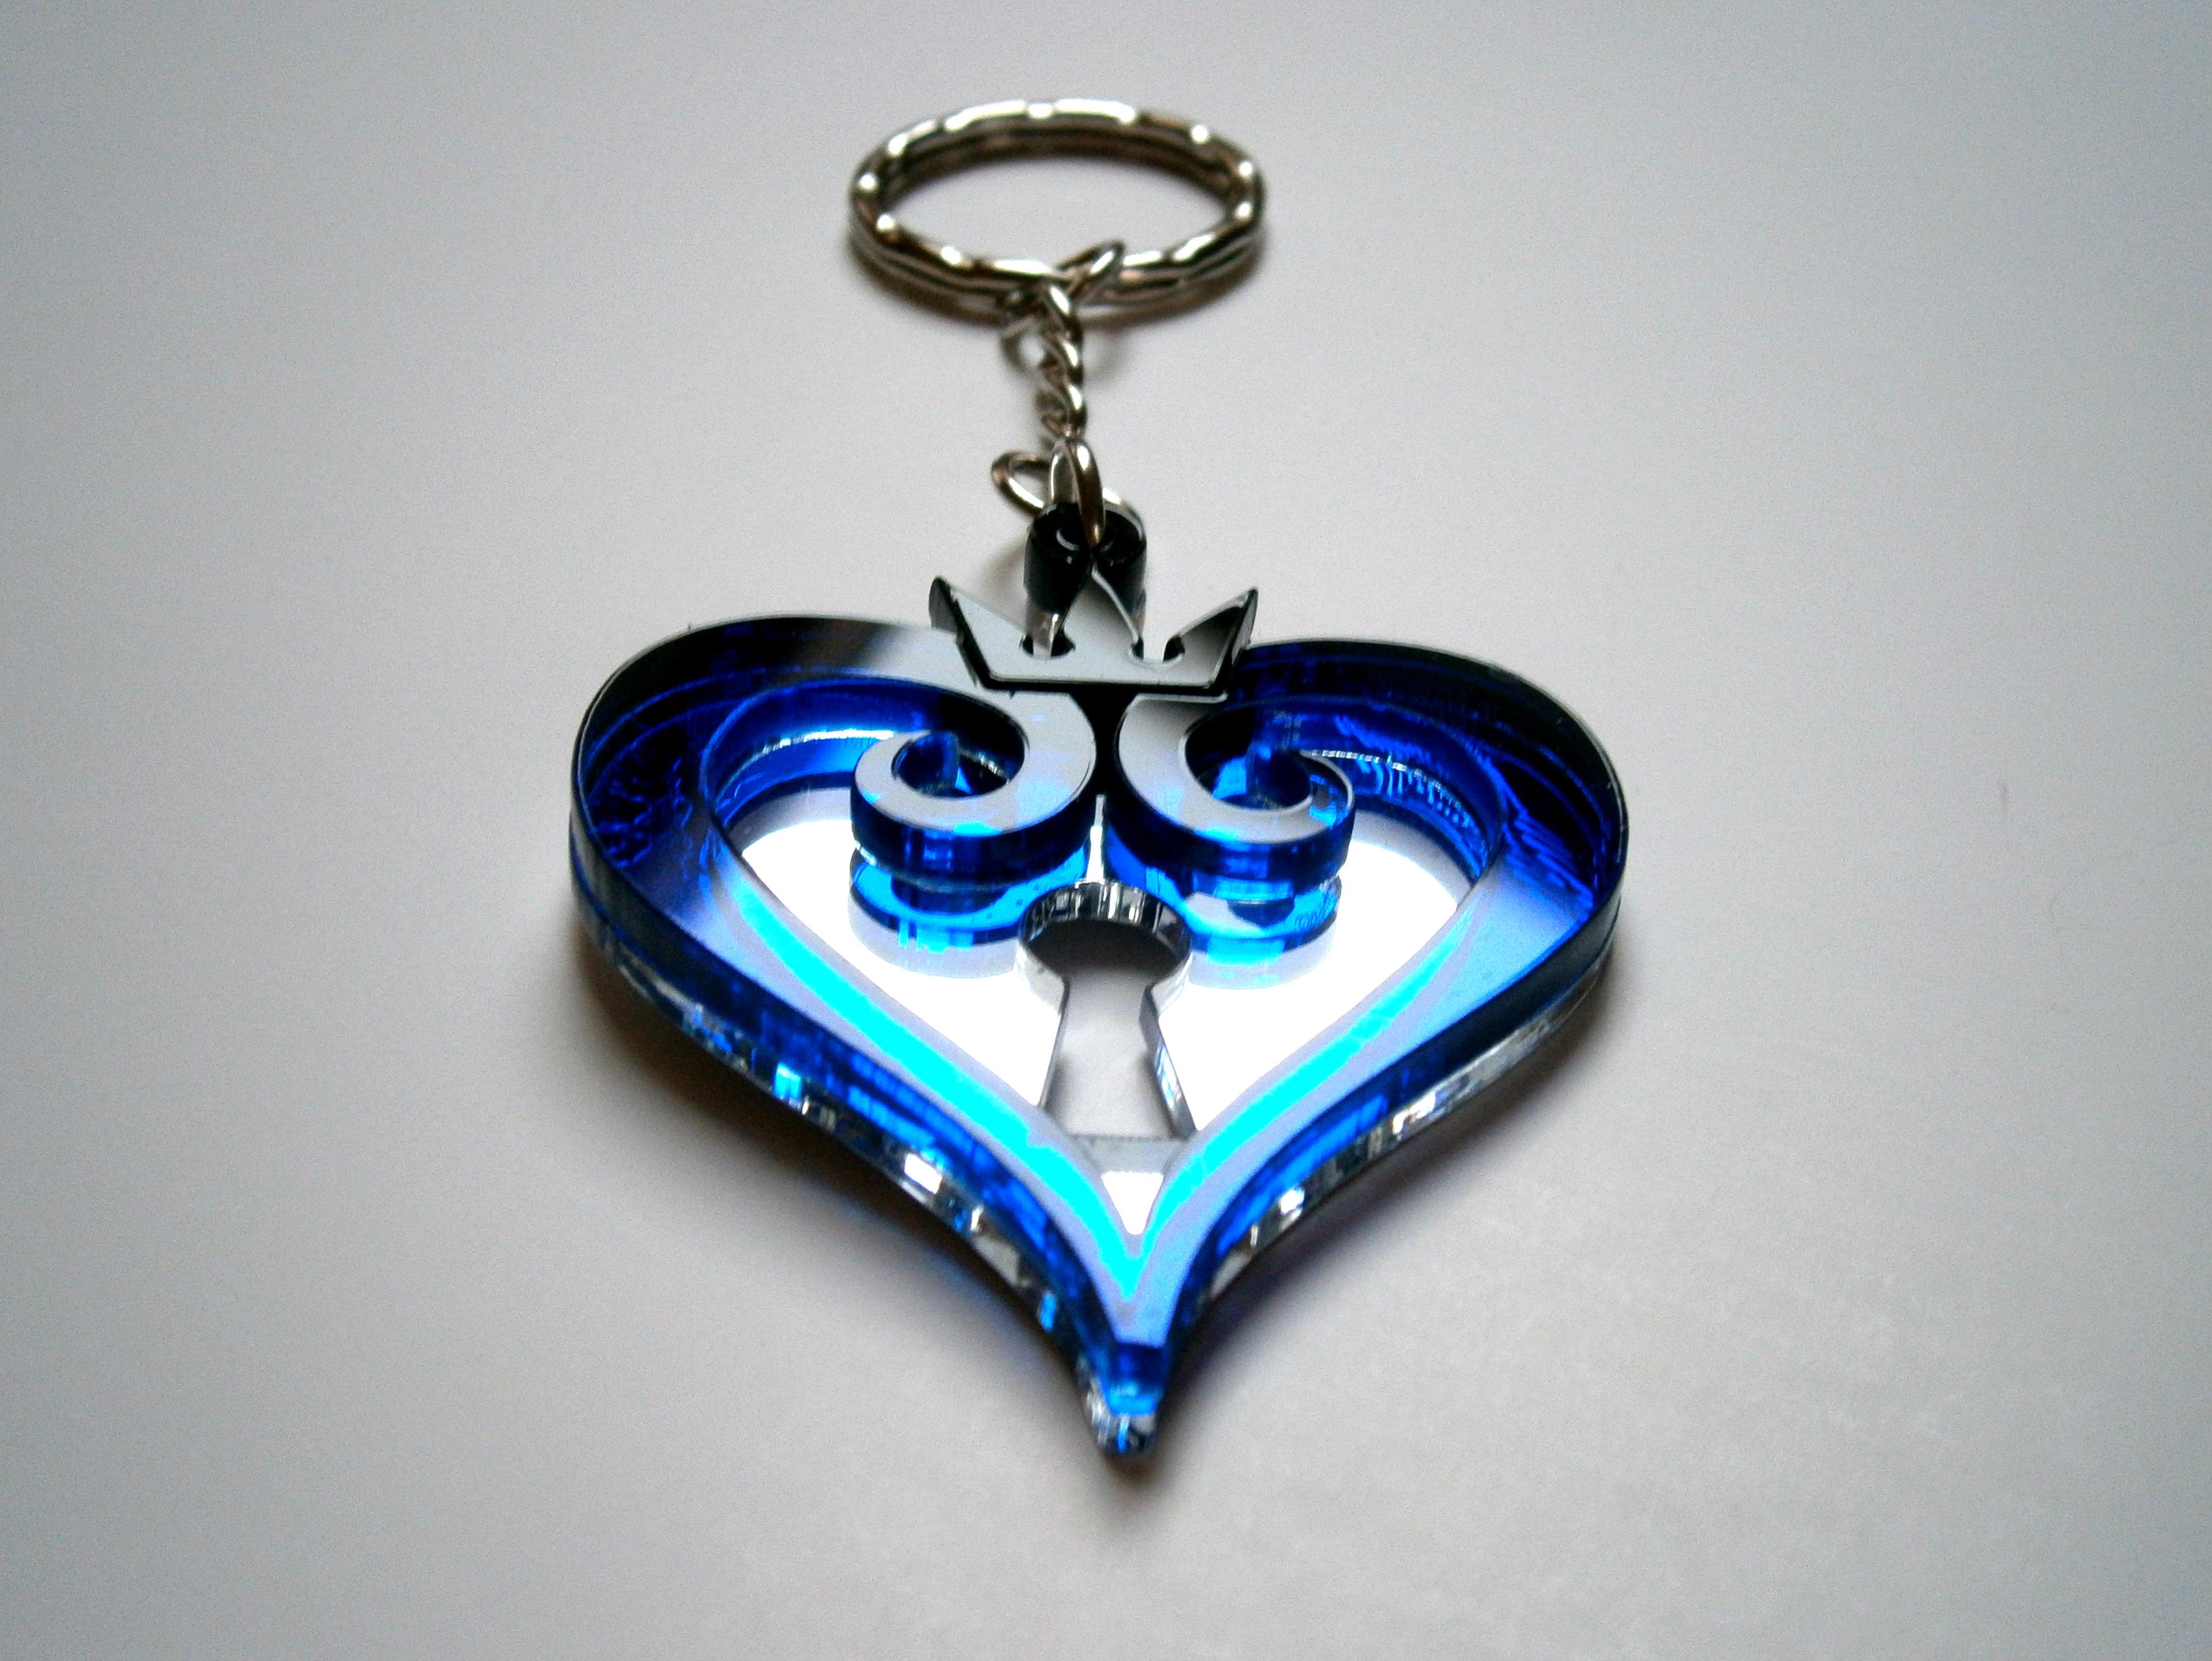 Kingdom Hearts Heartless Necklace Pendant Sale